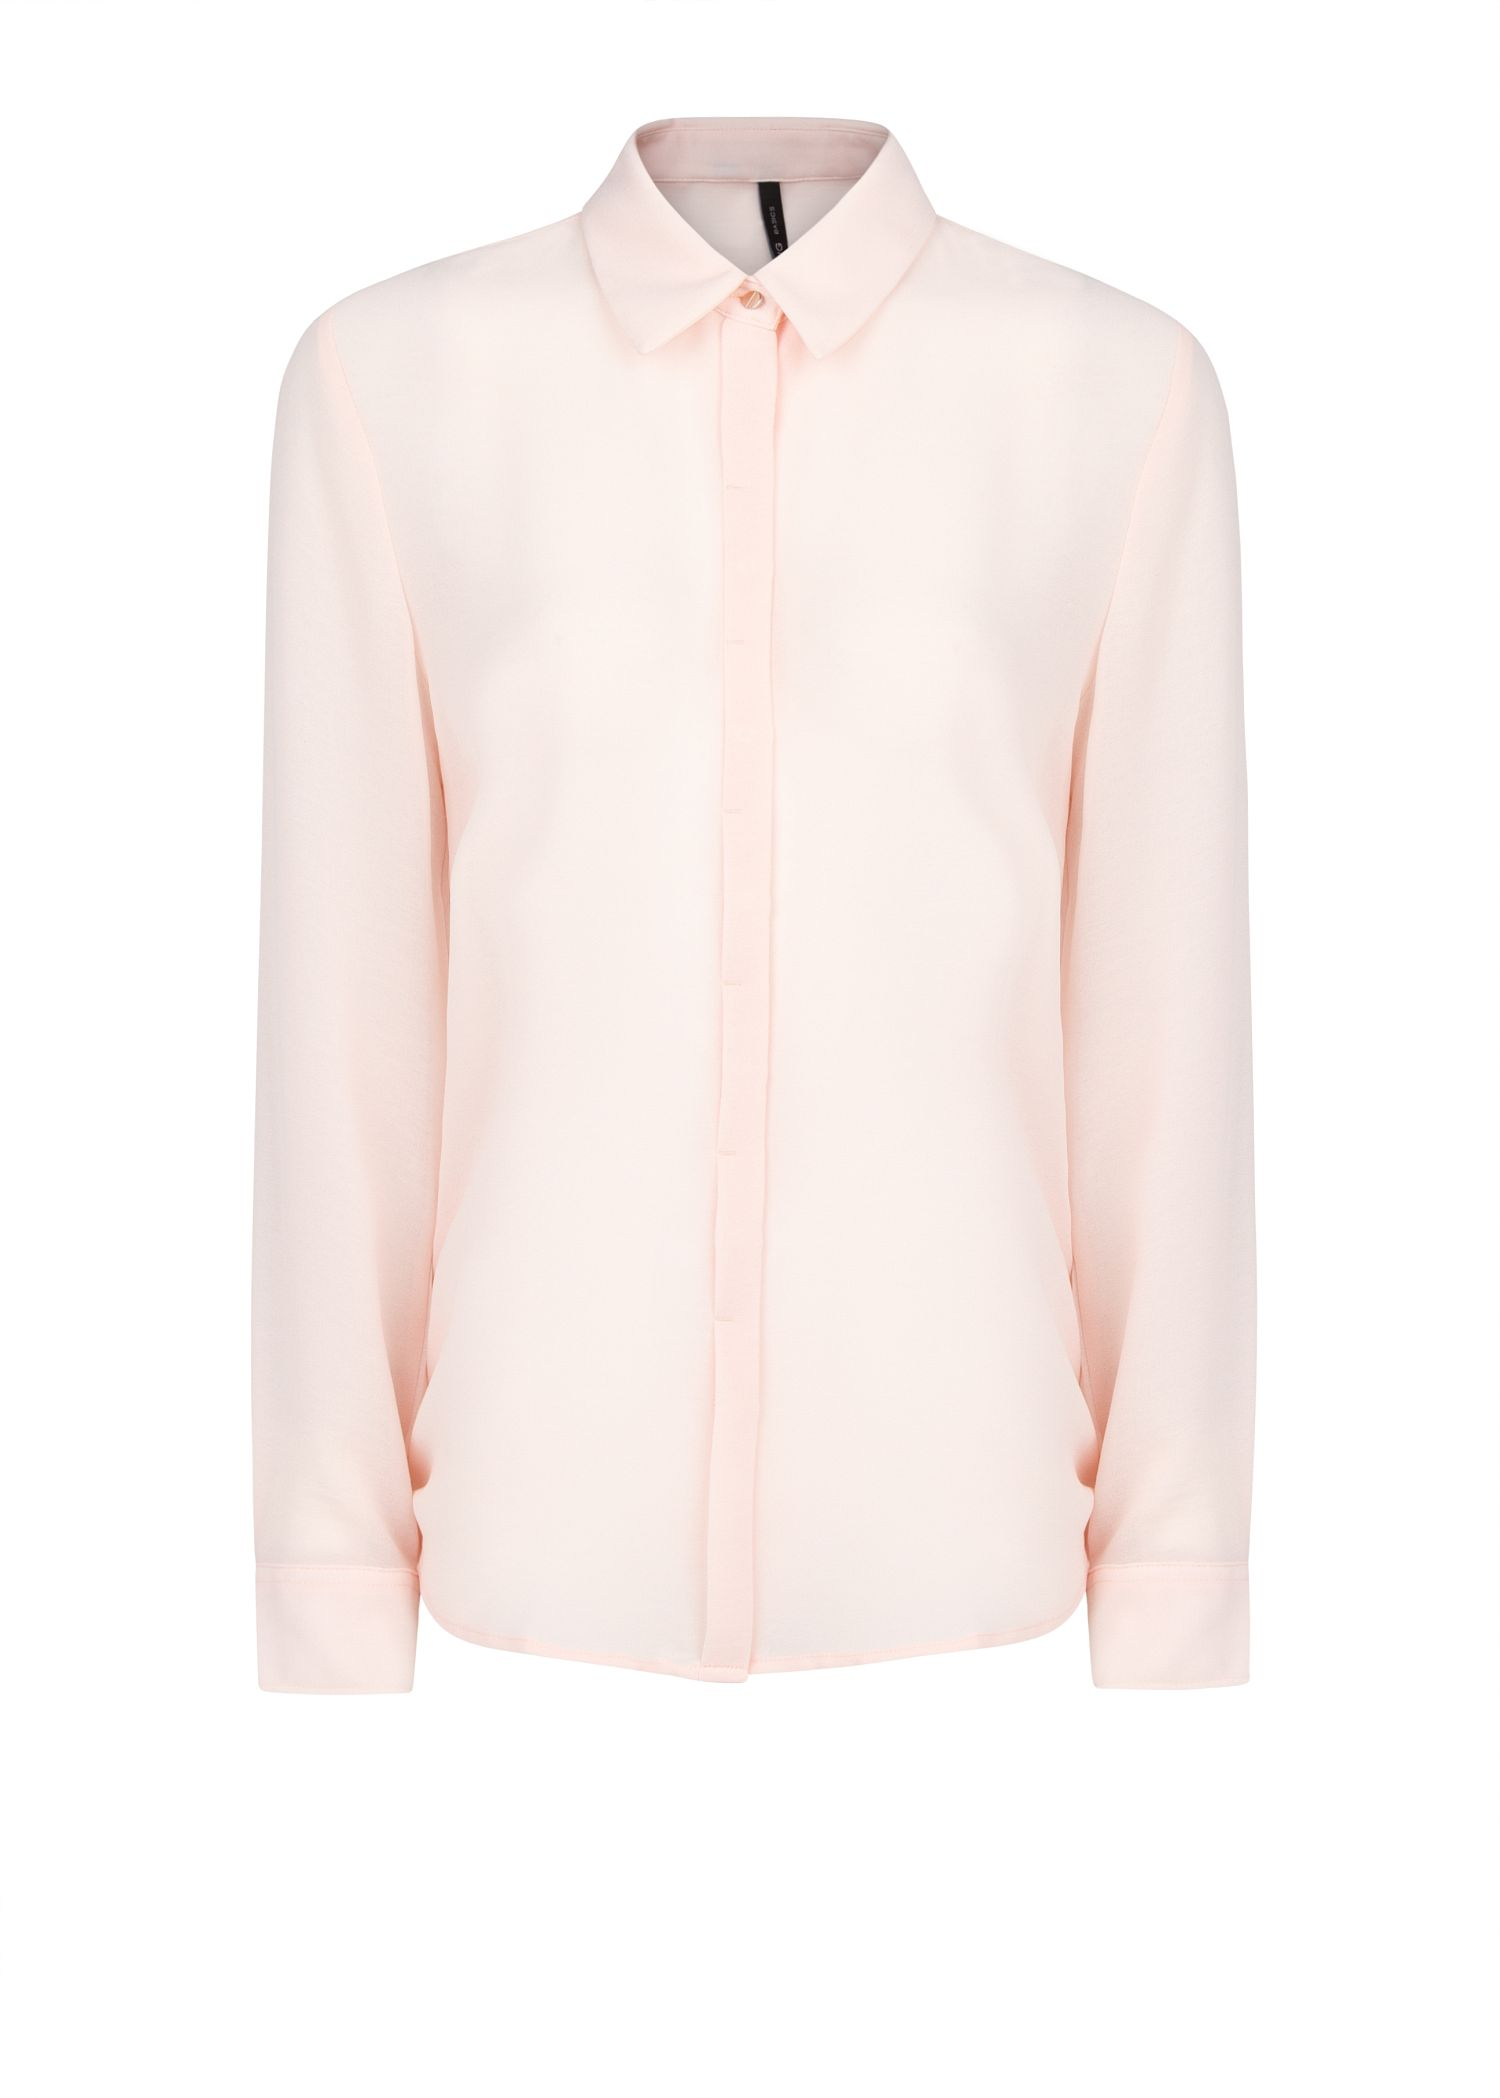 Mango Long Sleeve Flowy Shirt in Pink | Lyst